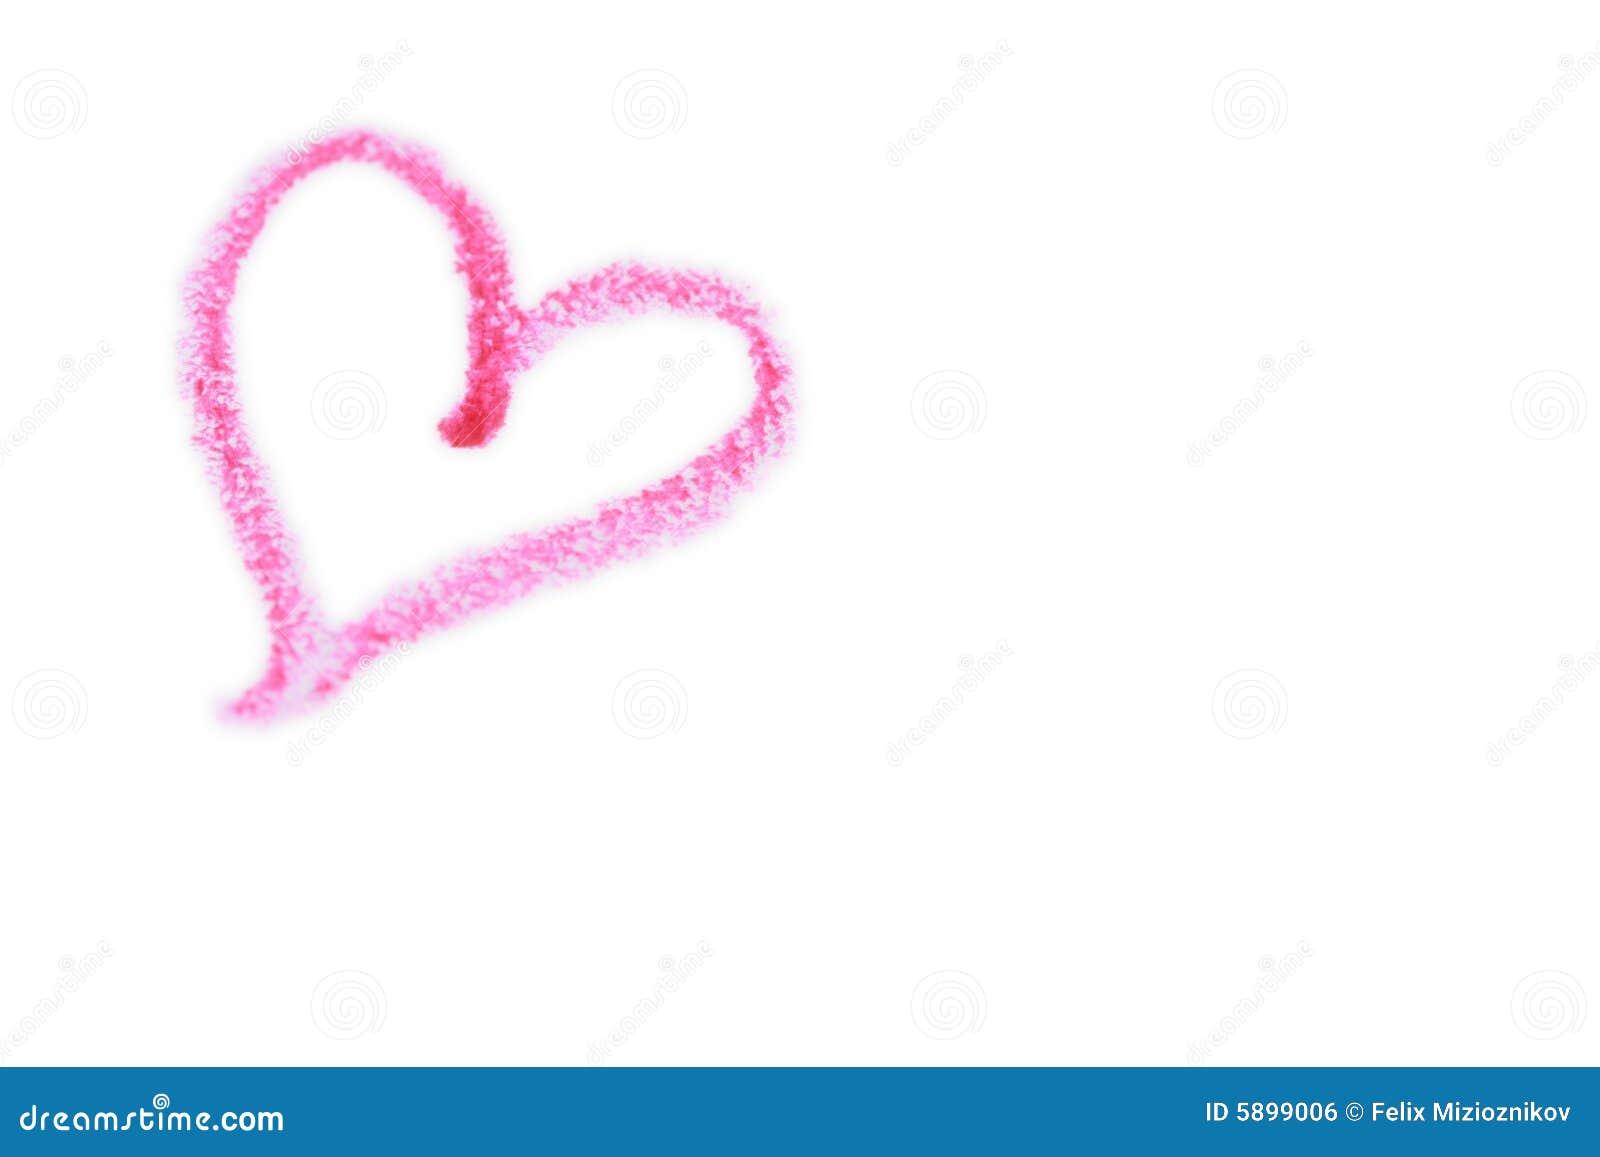 Crayon Pink Heart Royalty Free Stock Image - Image: 5899006